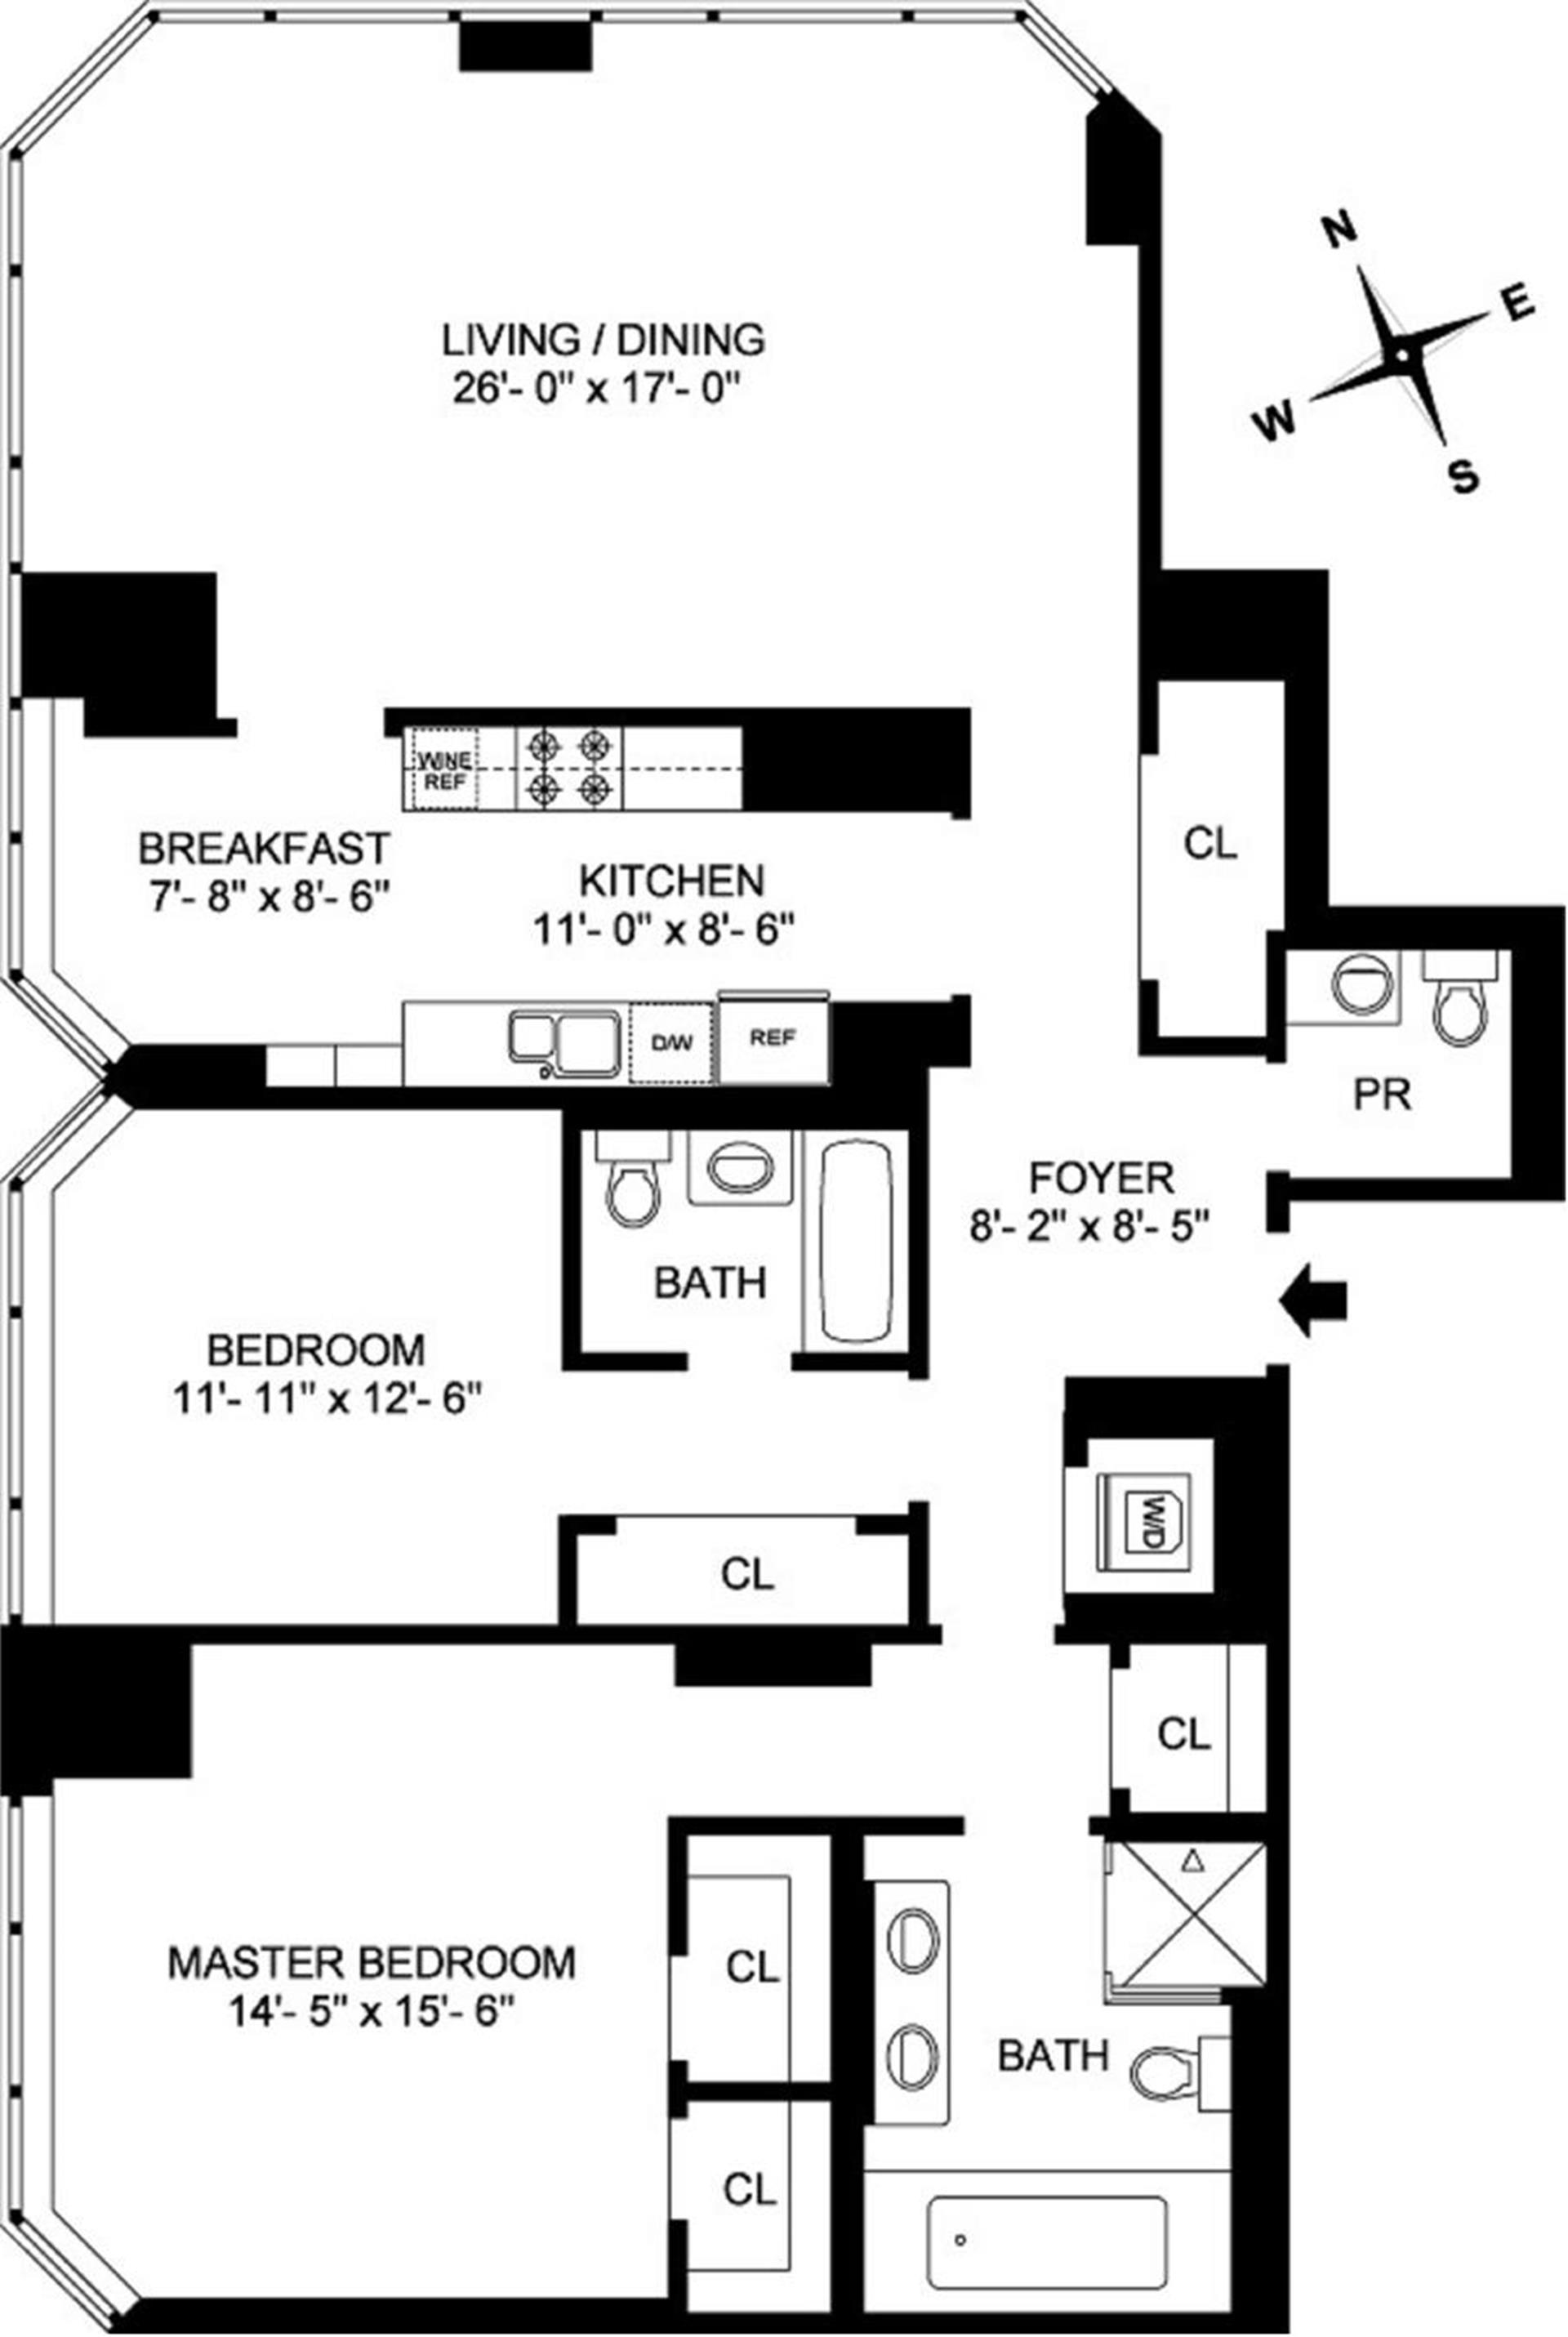 Floor plan of 300 East 55th St, 27B - Midtown, New York